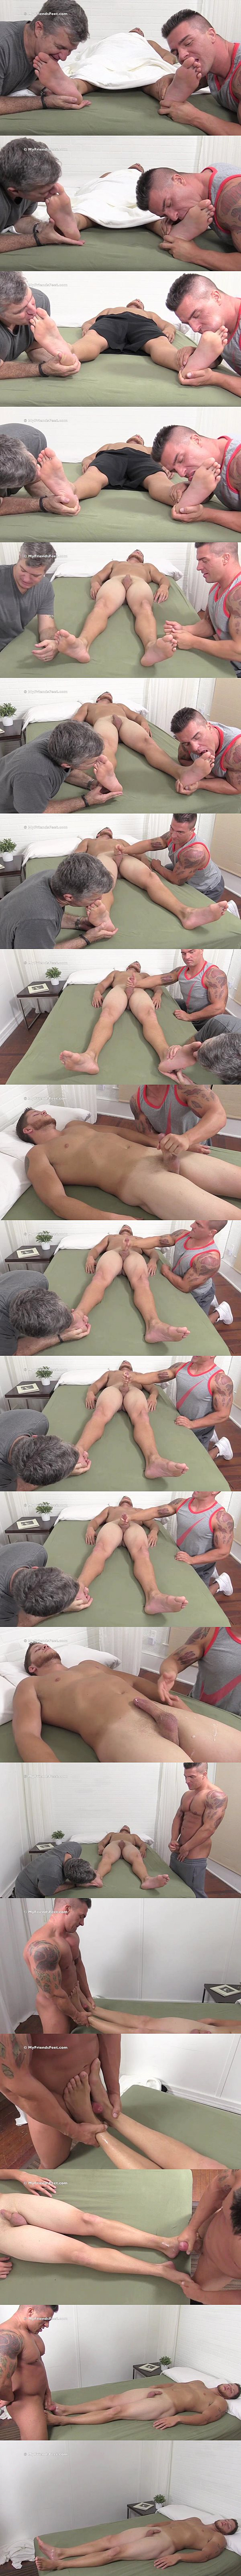 Braden Charron worships sleeping Marshall's big feet before he jerks the cum out of Marshall's hard cock and foot fucks Marshall till he cums at Myfriendsfeet 02